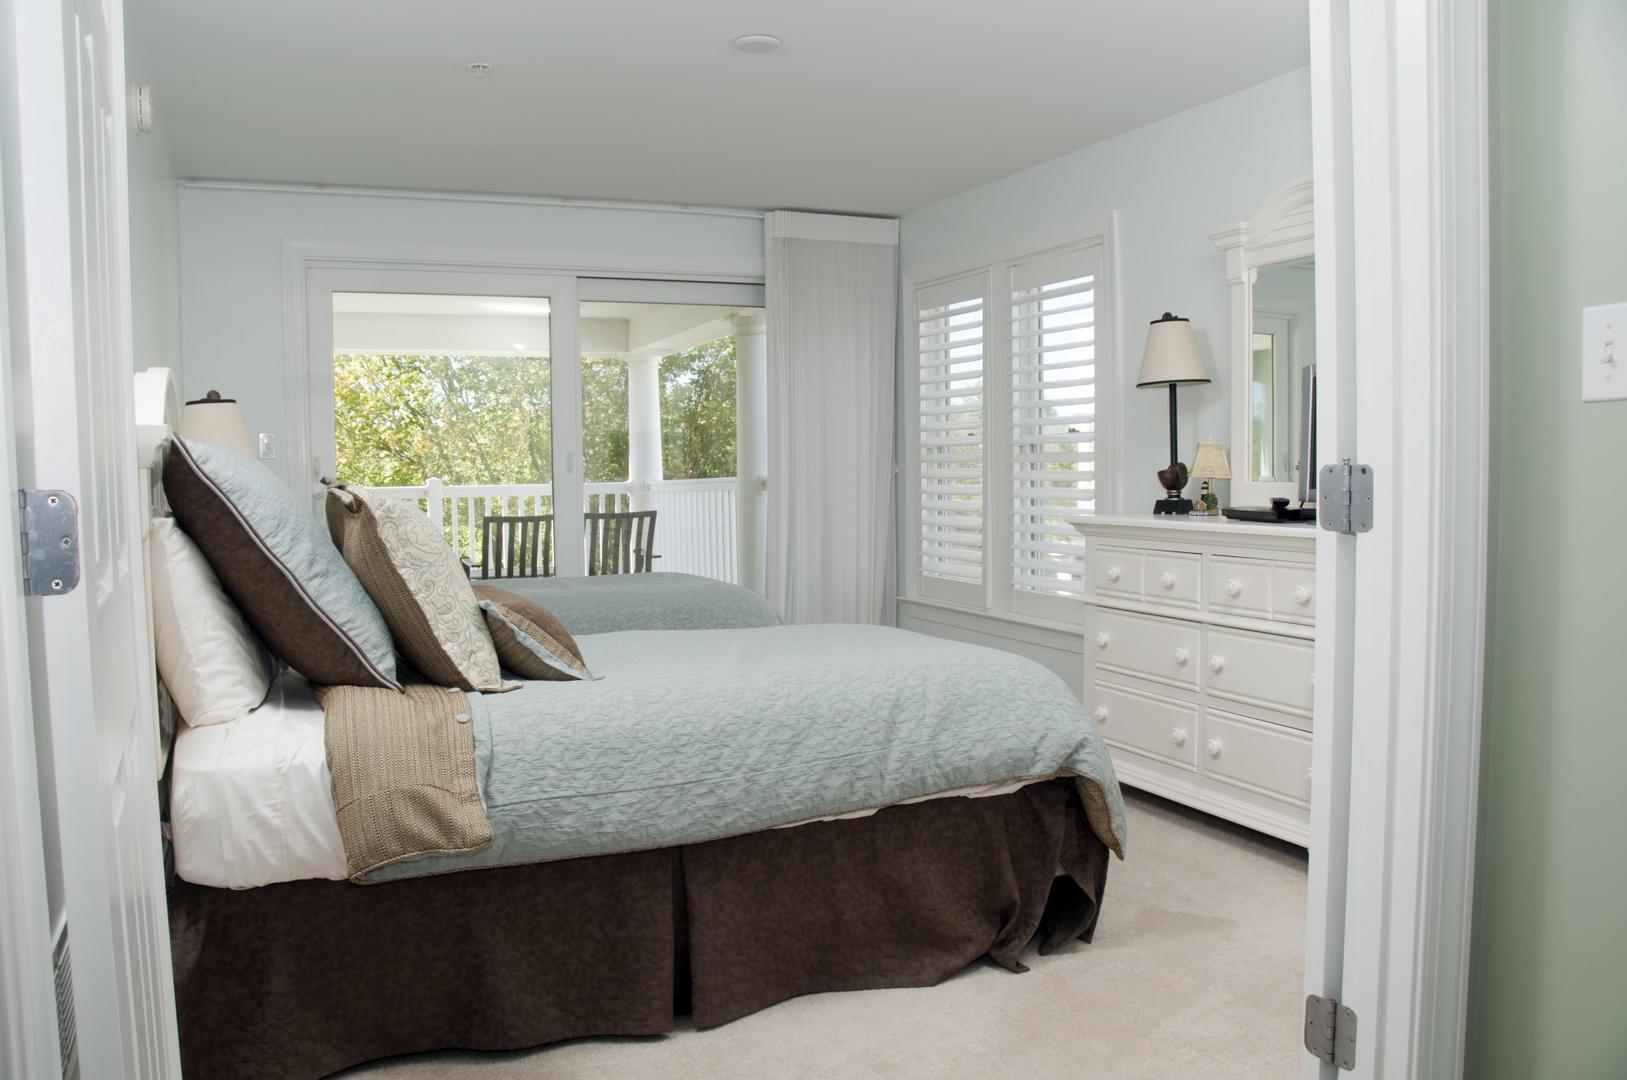 Salt Meadows 40142 - Bedroom 2